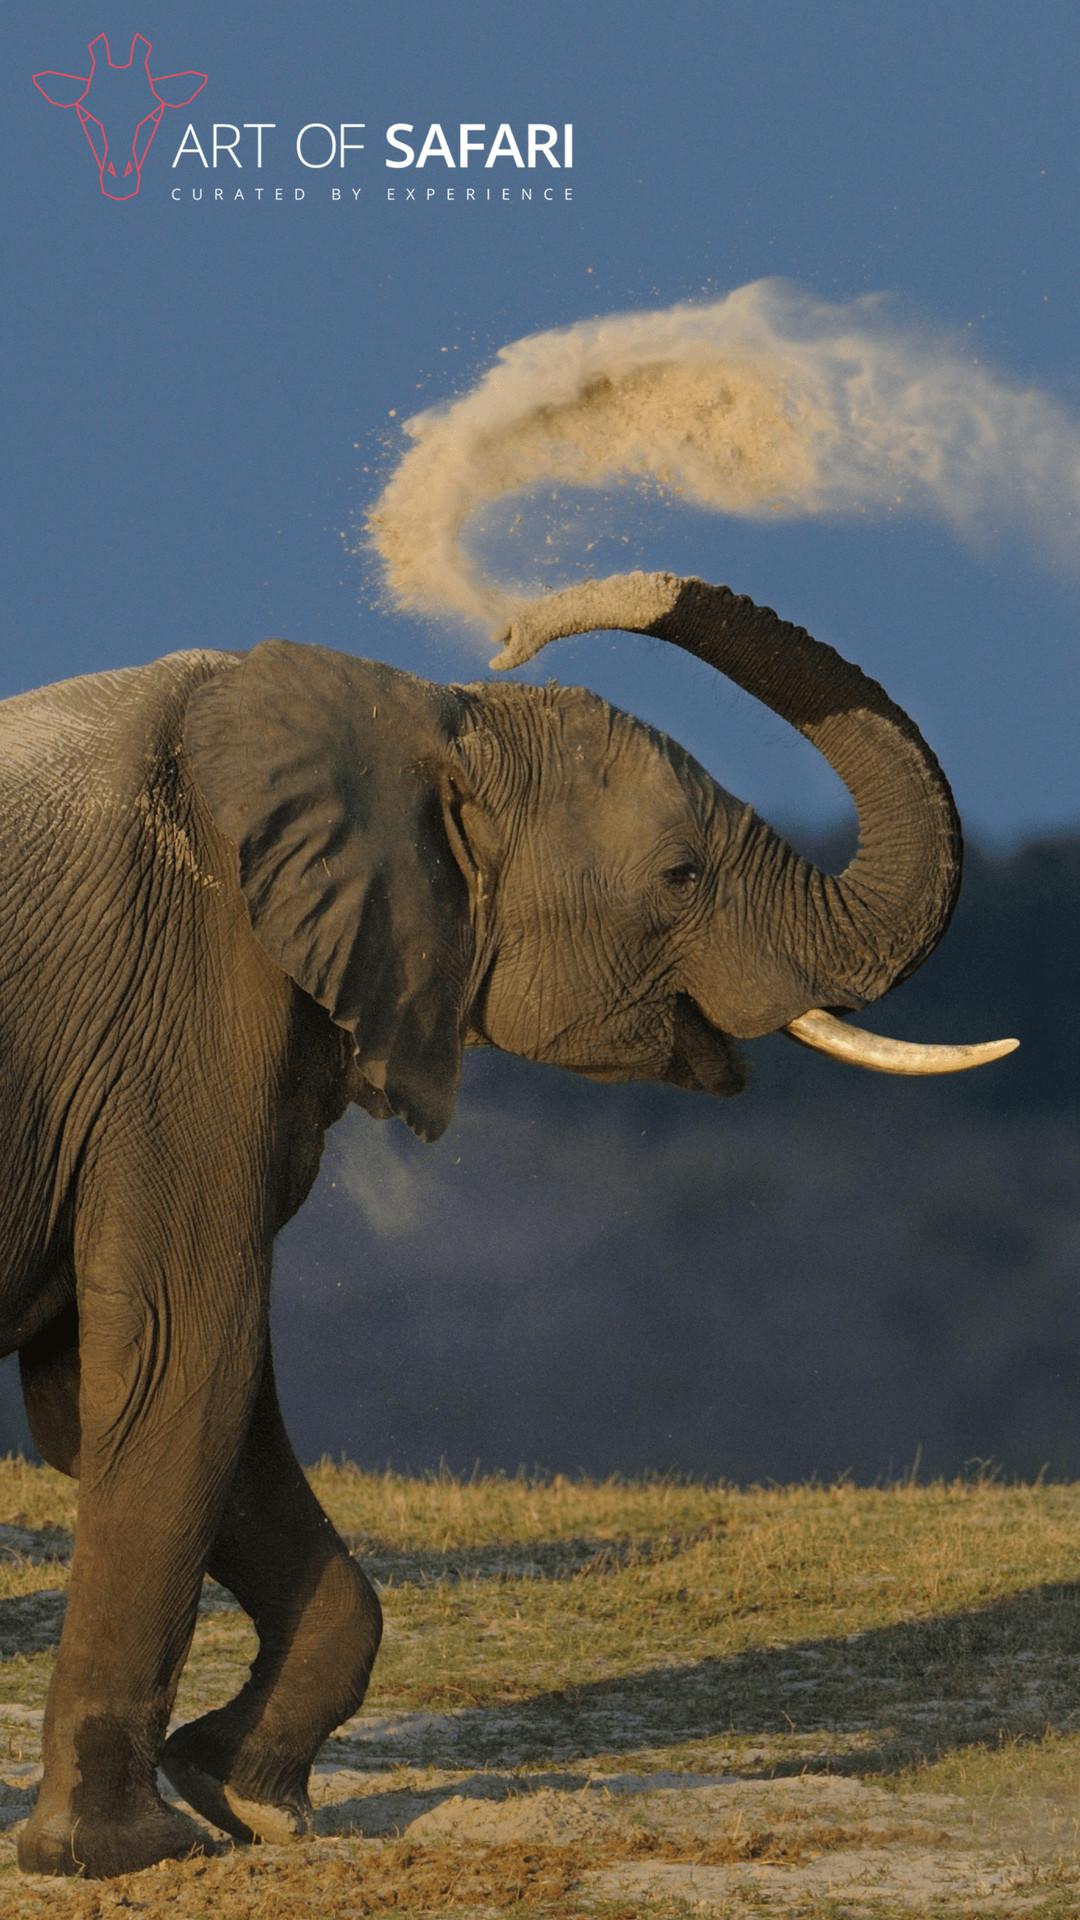 Cute Cartoon Family Wallpaper Elephant Iphone Wallpaper 74 Images